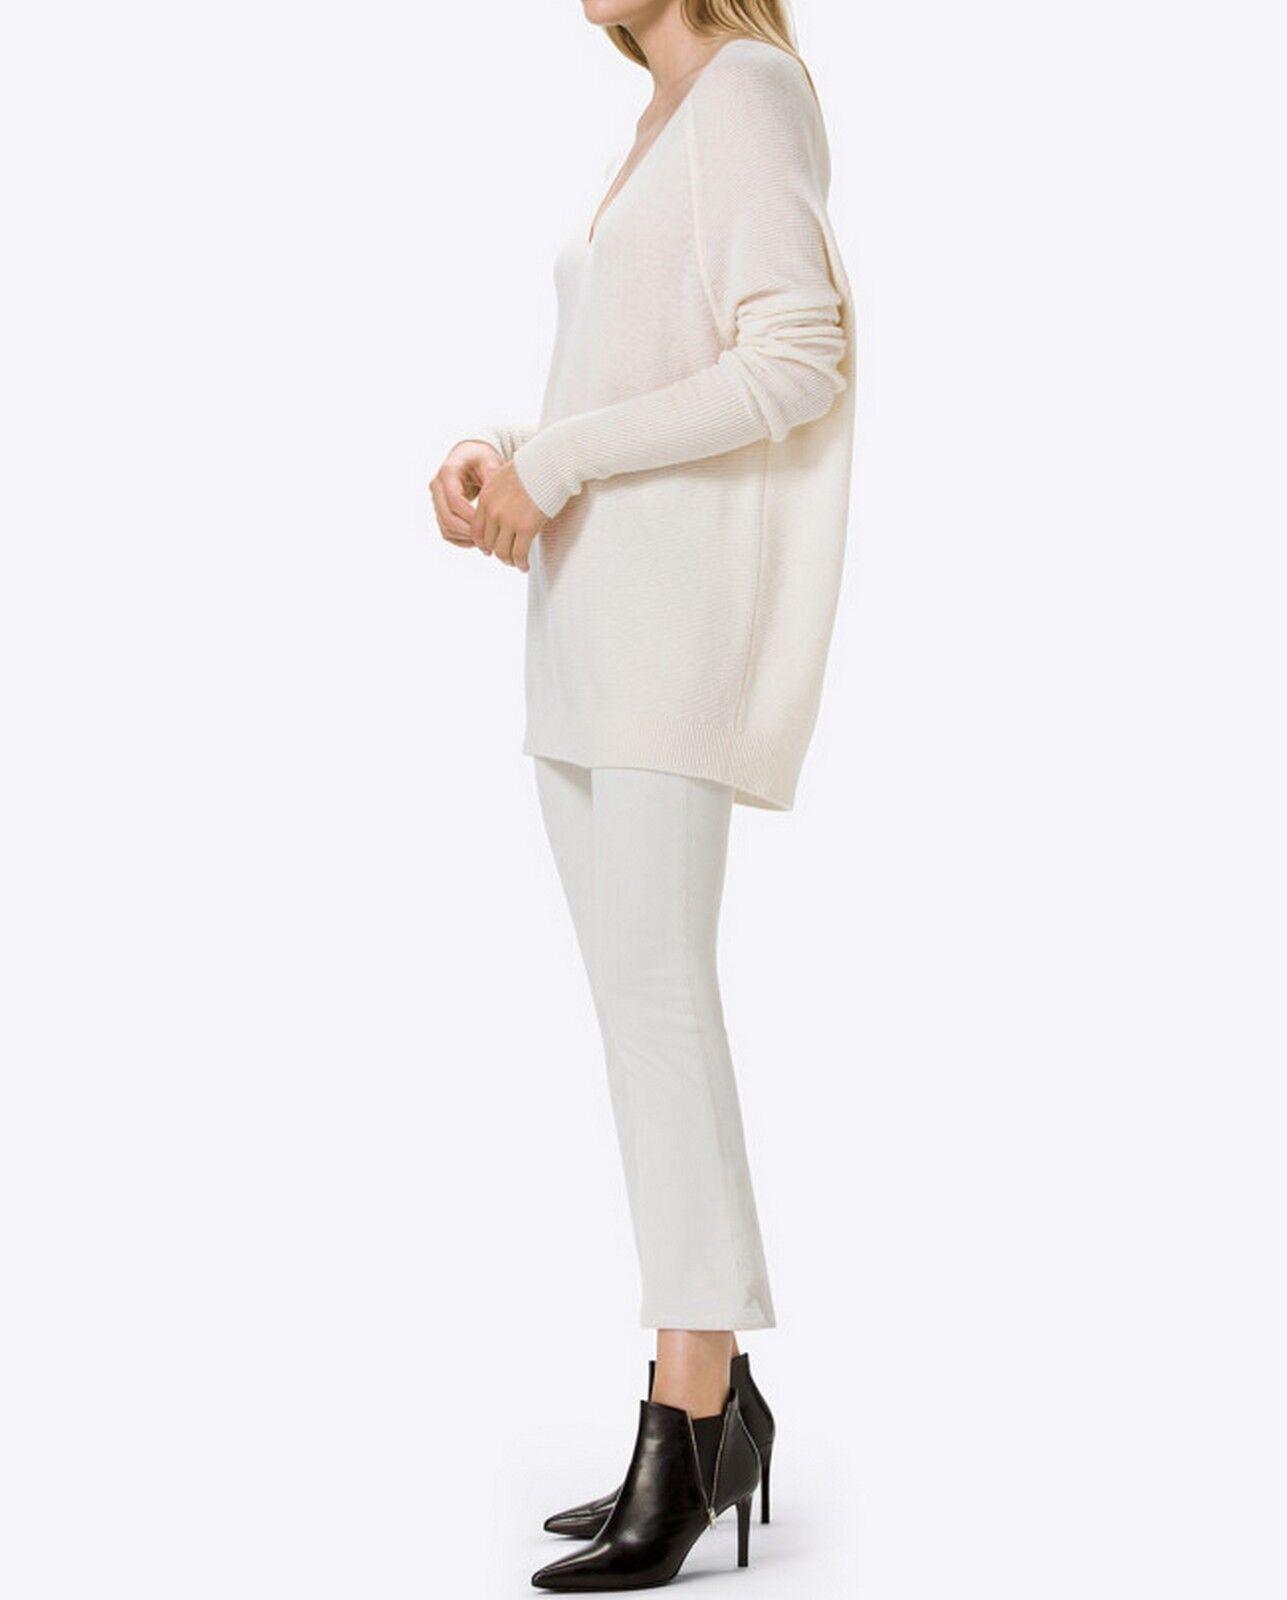 NWT J Brand Selena Corduroy Mid Rise Pants, MOONBEAM, SIZE 30,  198 retail